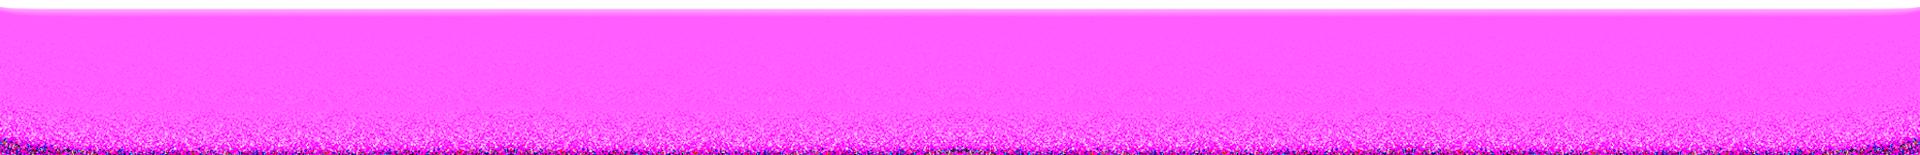 Top Neon Divider 1920x FULL